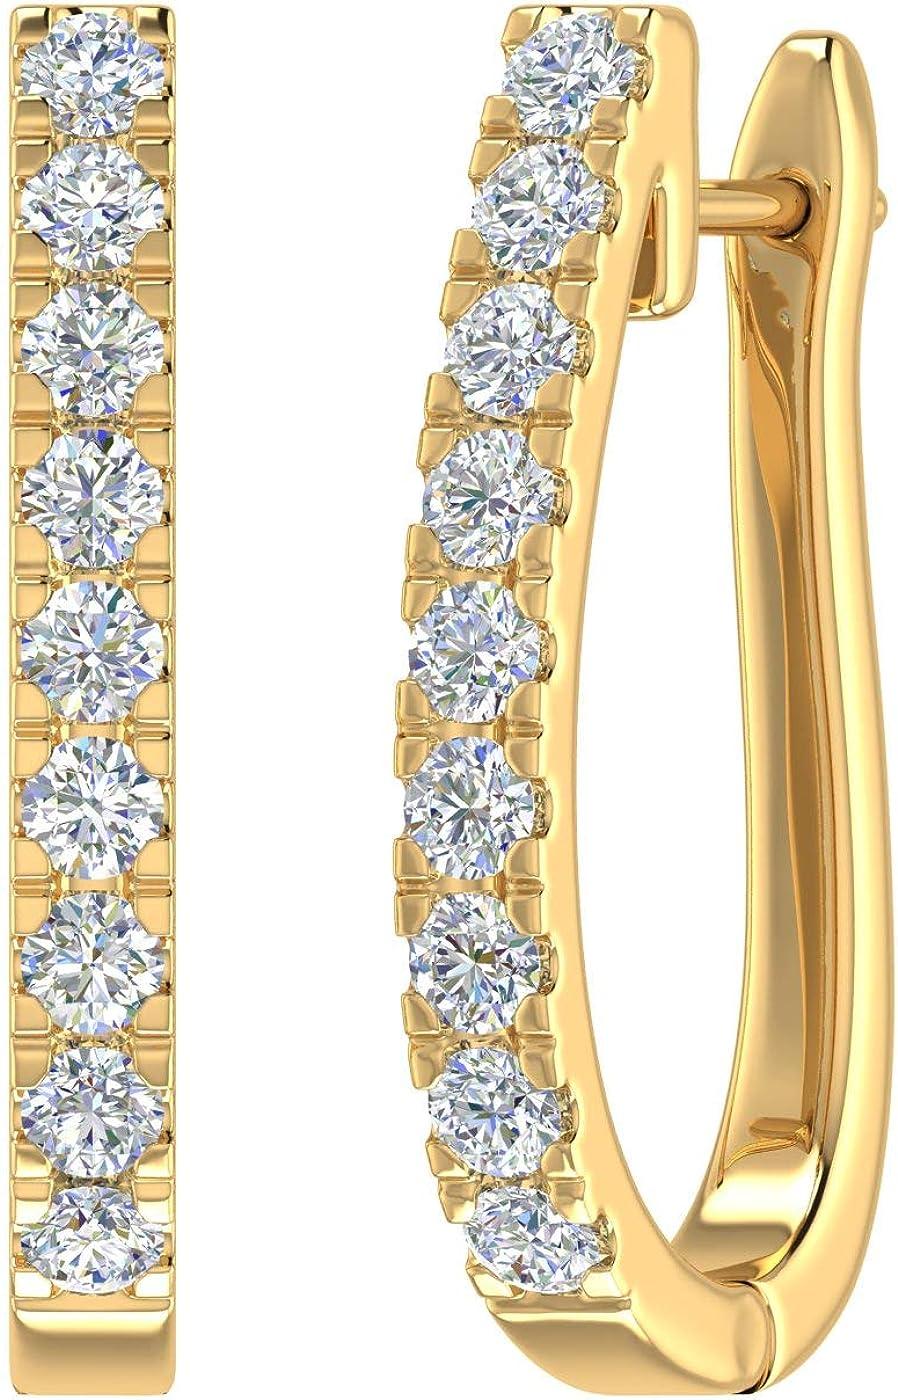 1/4 Carat to 1 Carat Diamond Hoop Earrings In 14K Gold